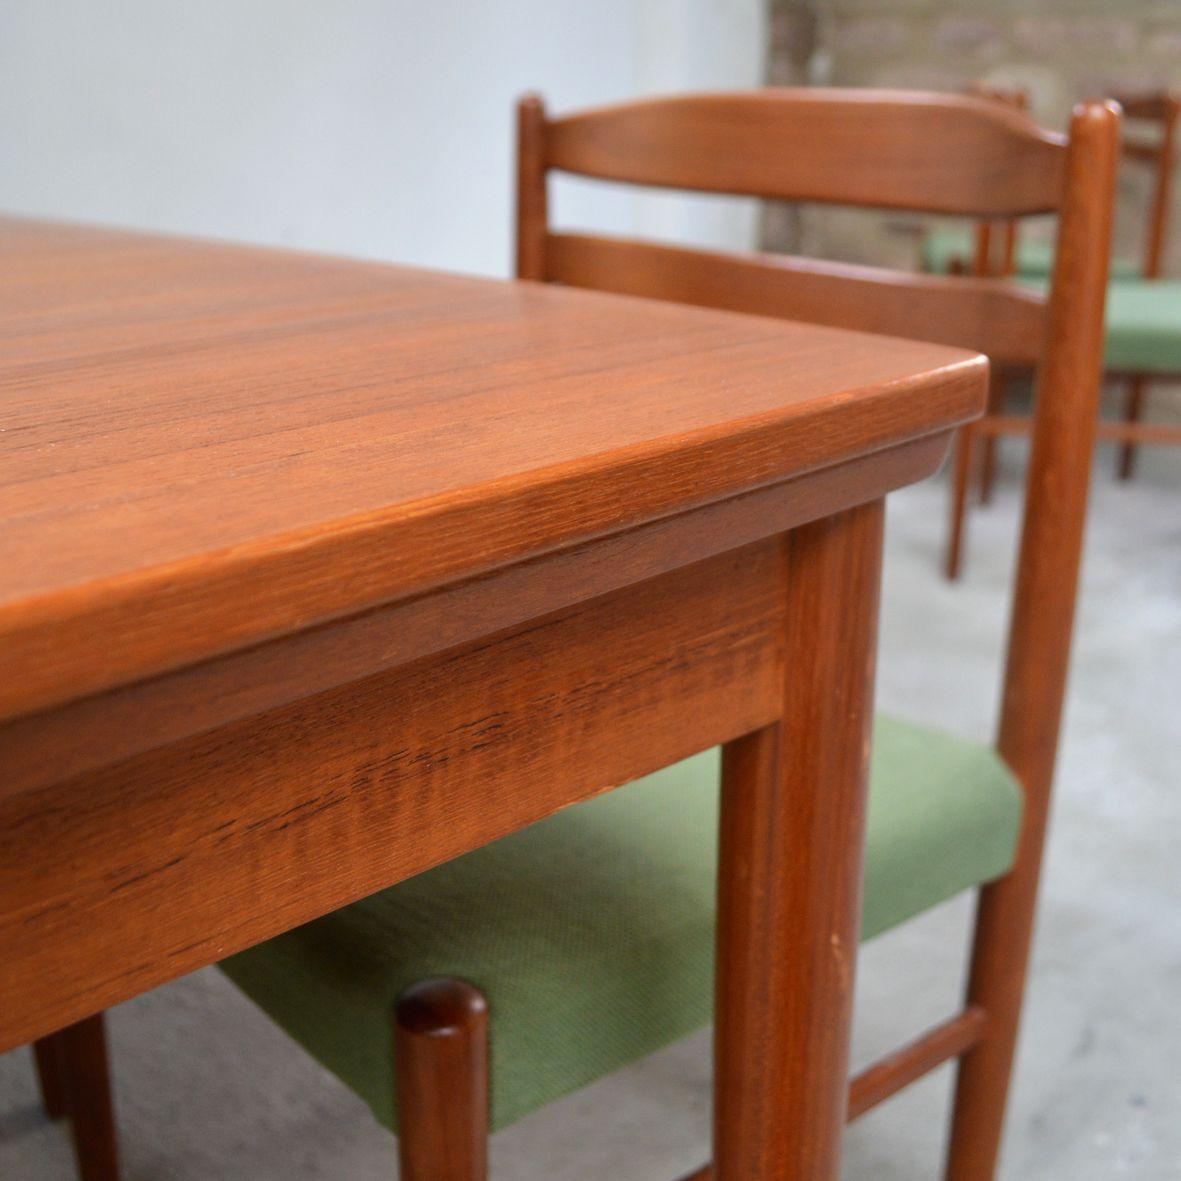 skandinavische mid century teak st hle 4er set bei pamono kaufen. Black Bedroom Furniture Sets. Home Design Ideas